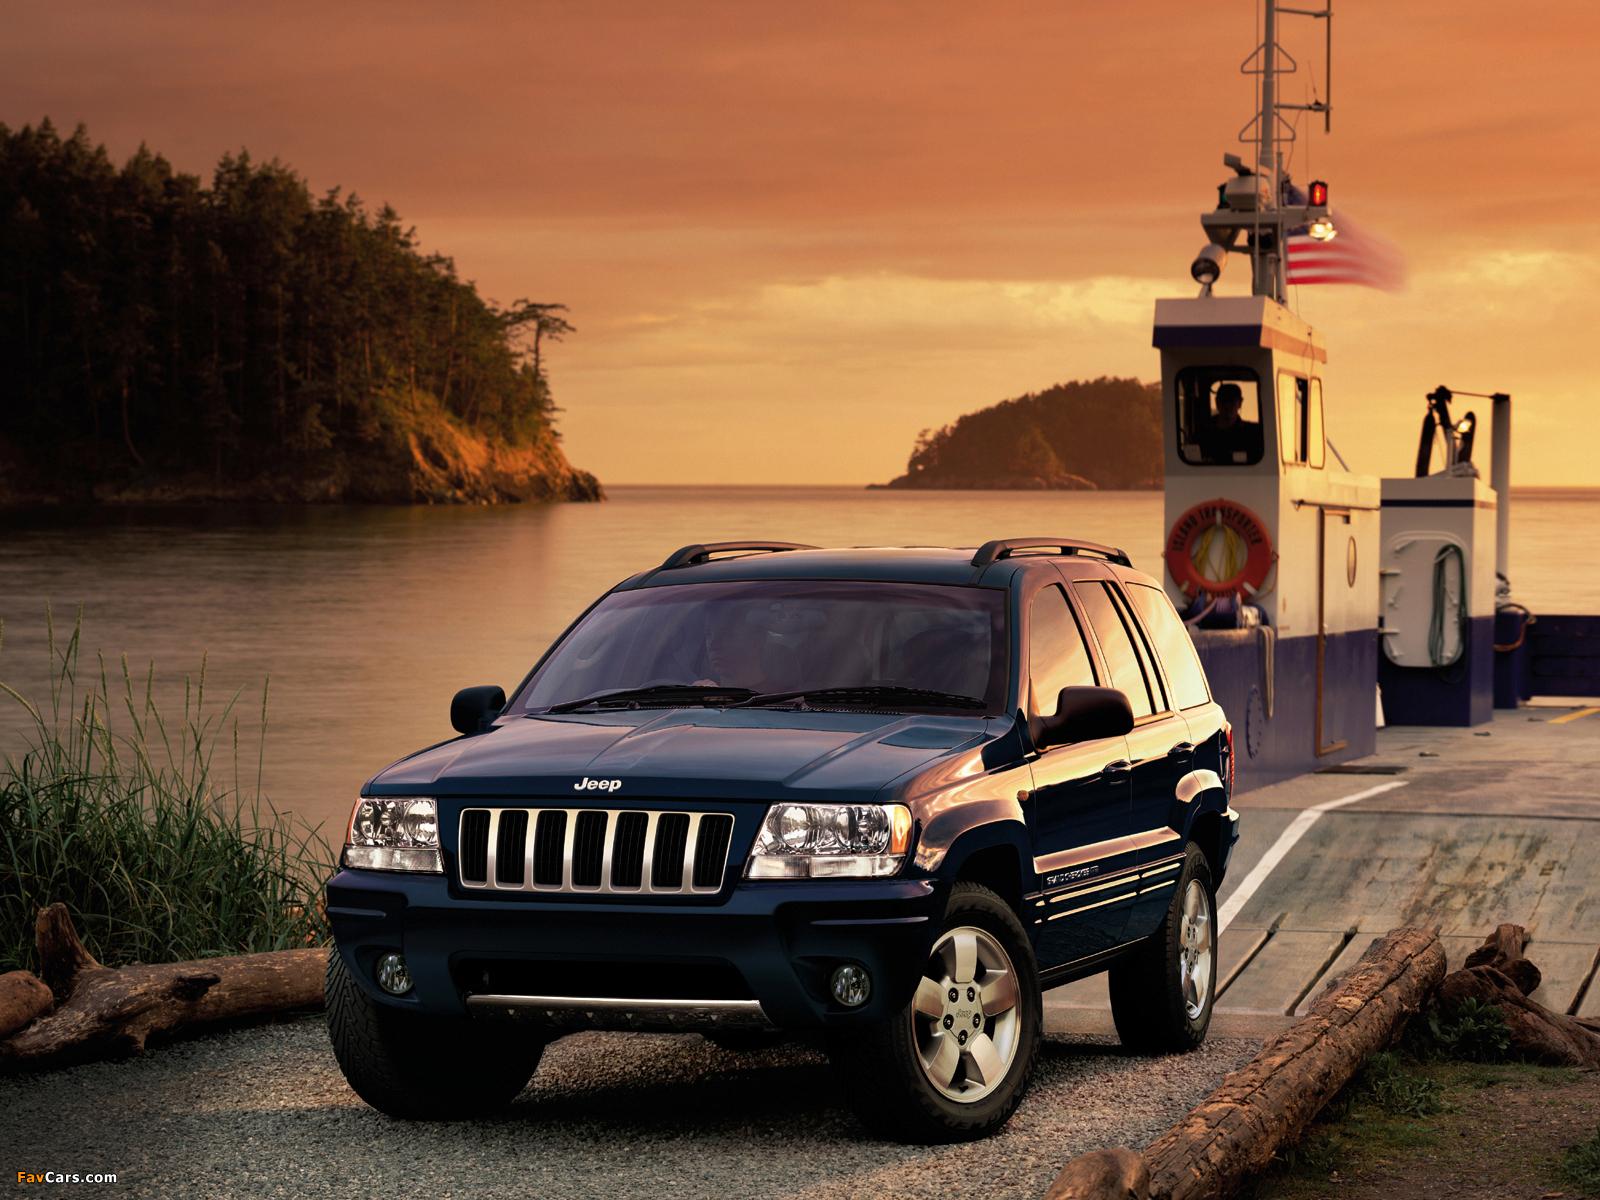 Jeep Grand Cherokee Wallpaper 20   1600 X 1200 stmednet 1600x1200